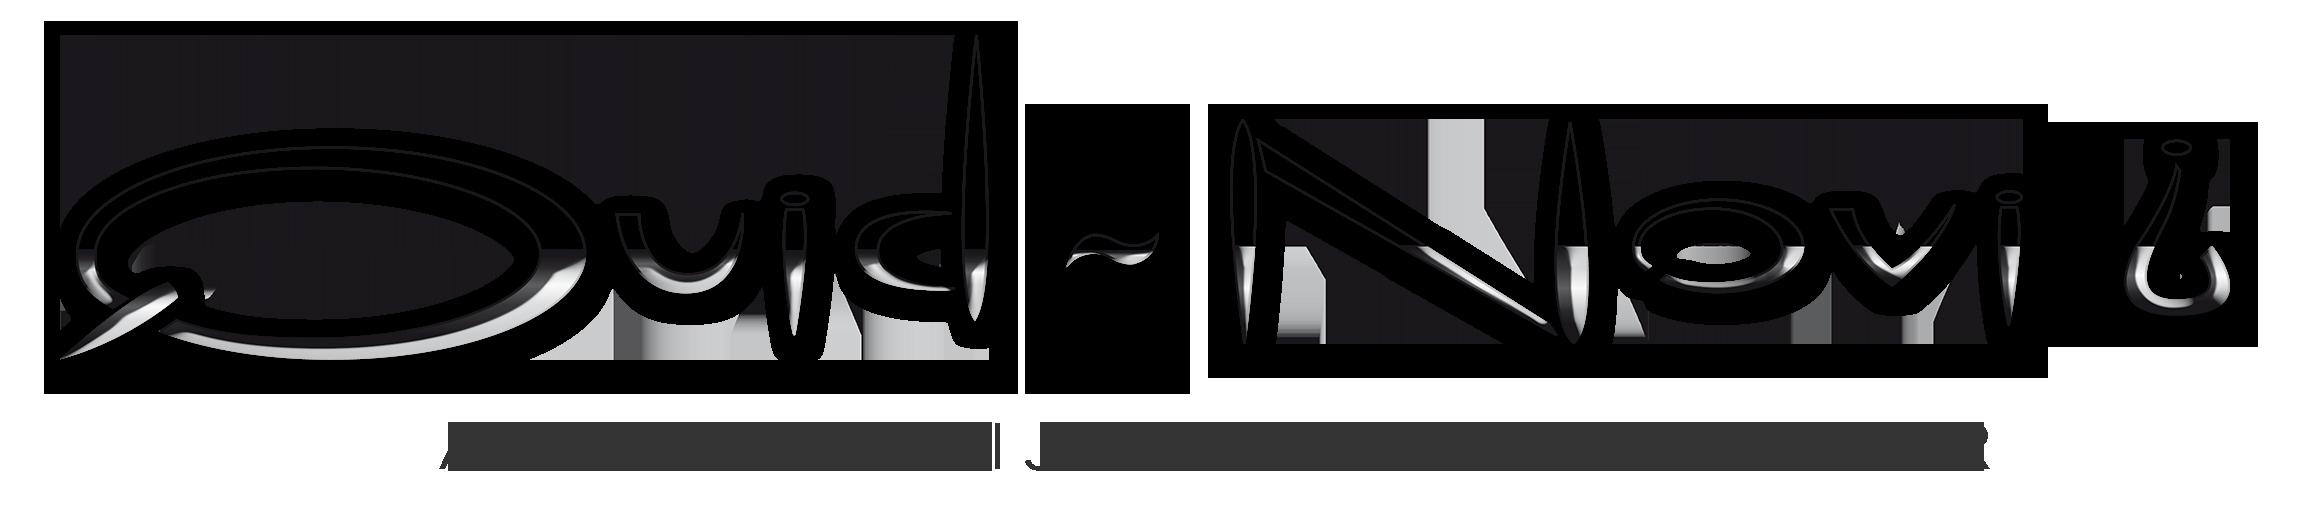 Quid Novi, bijoutier joaillier à Salies-de-Béarn (64)